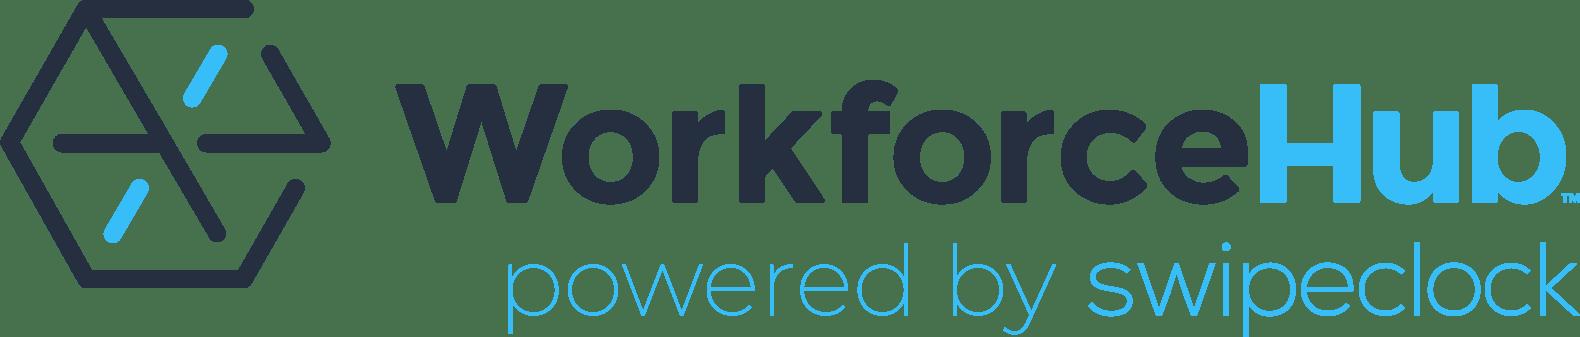 WorkforceHub_Logo_Swipeclock_2Color_RGB